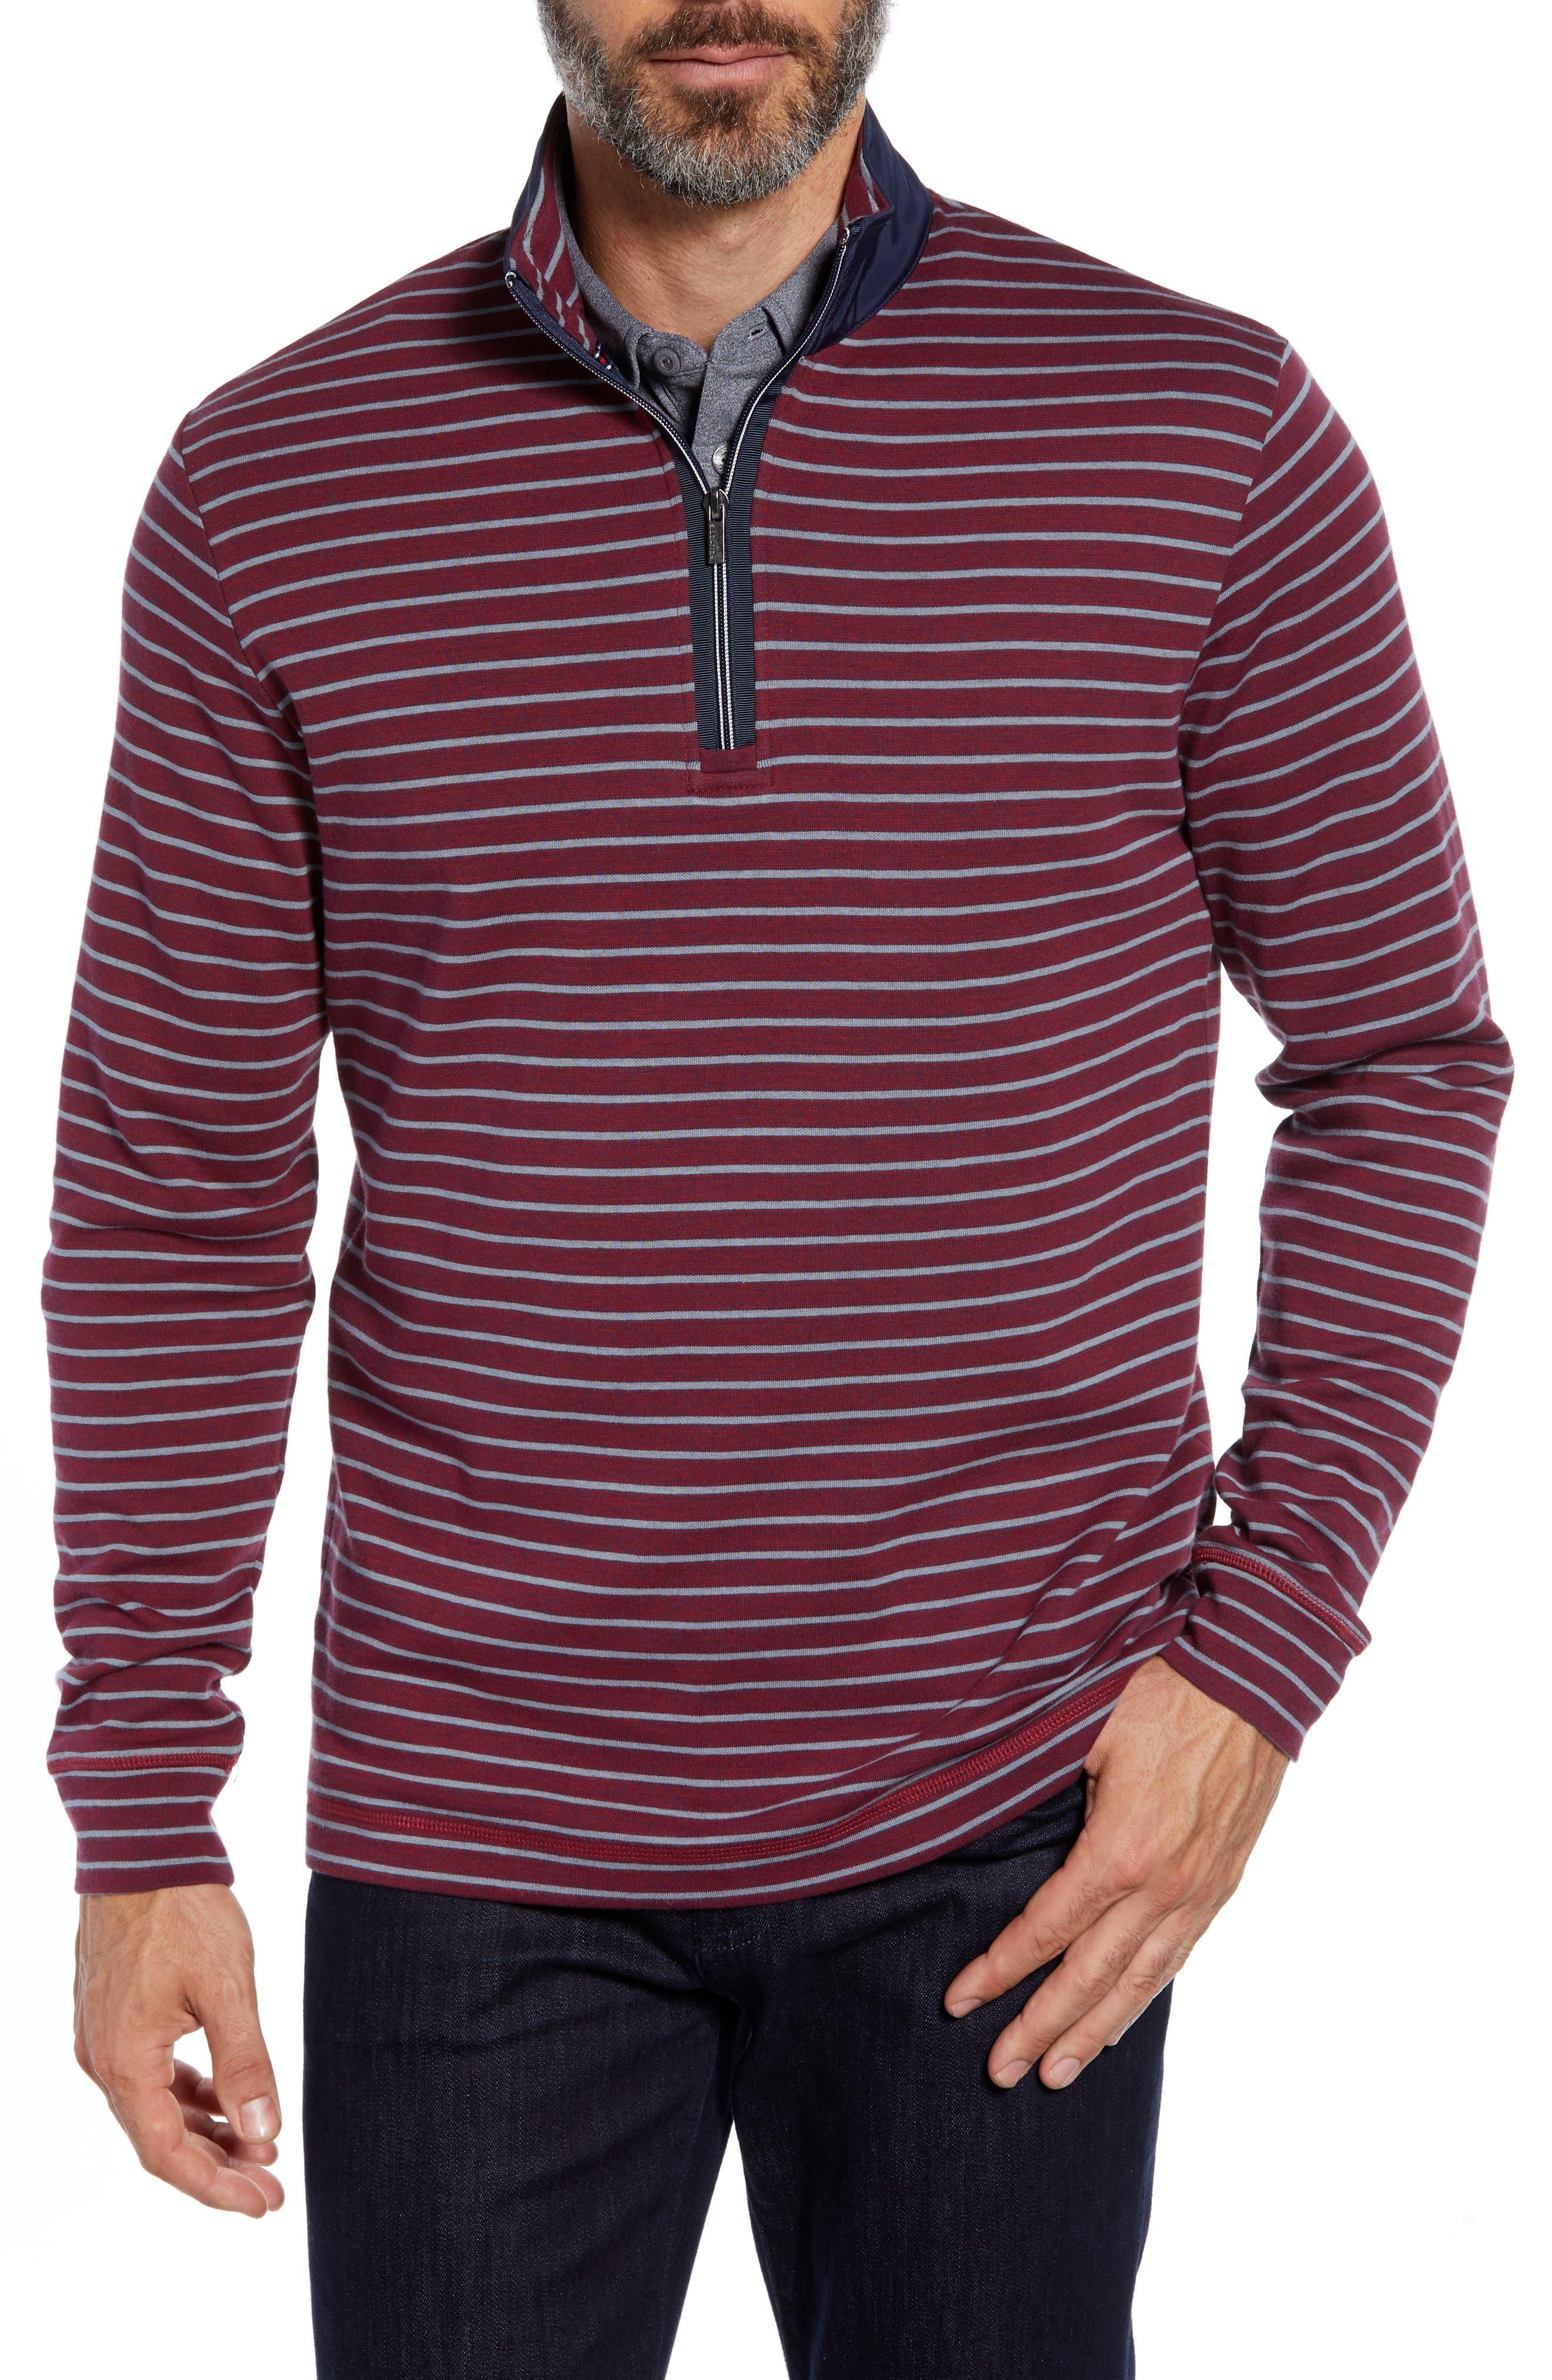 Bugatchi Striped Long Sleeve Half Zip Pullover Sweater Sweatshirt